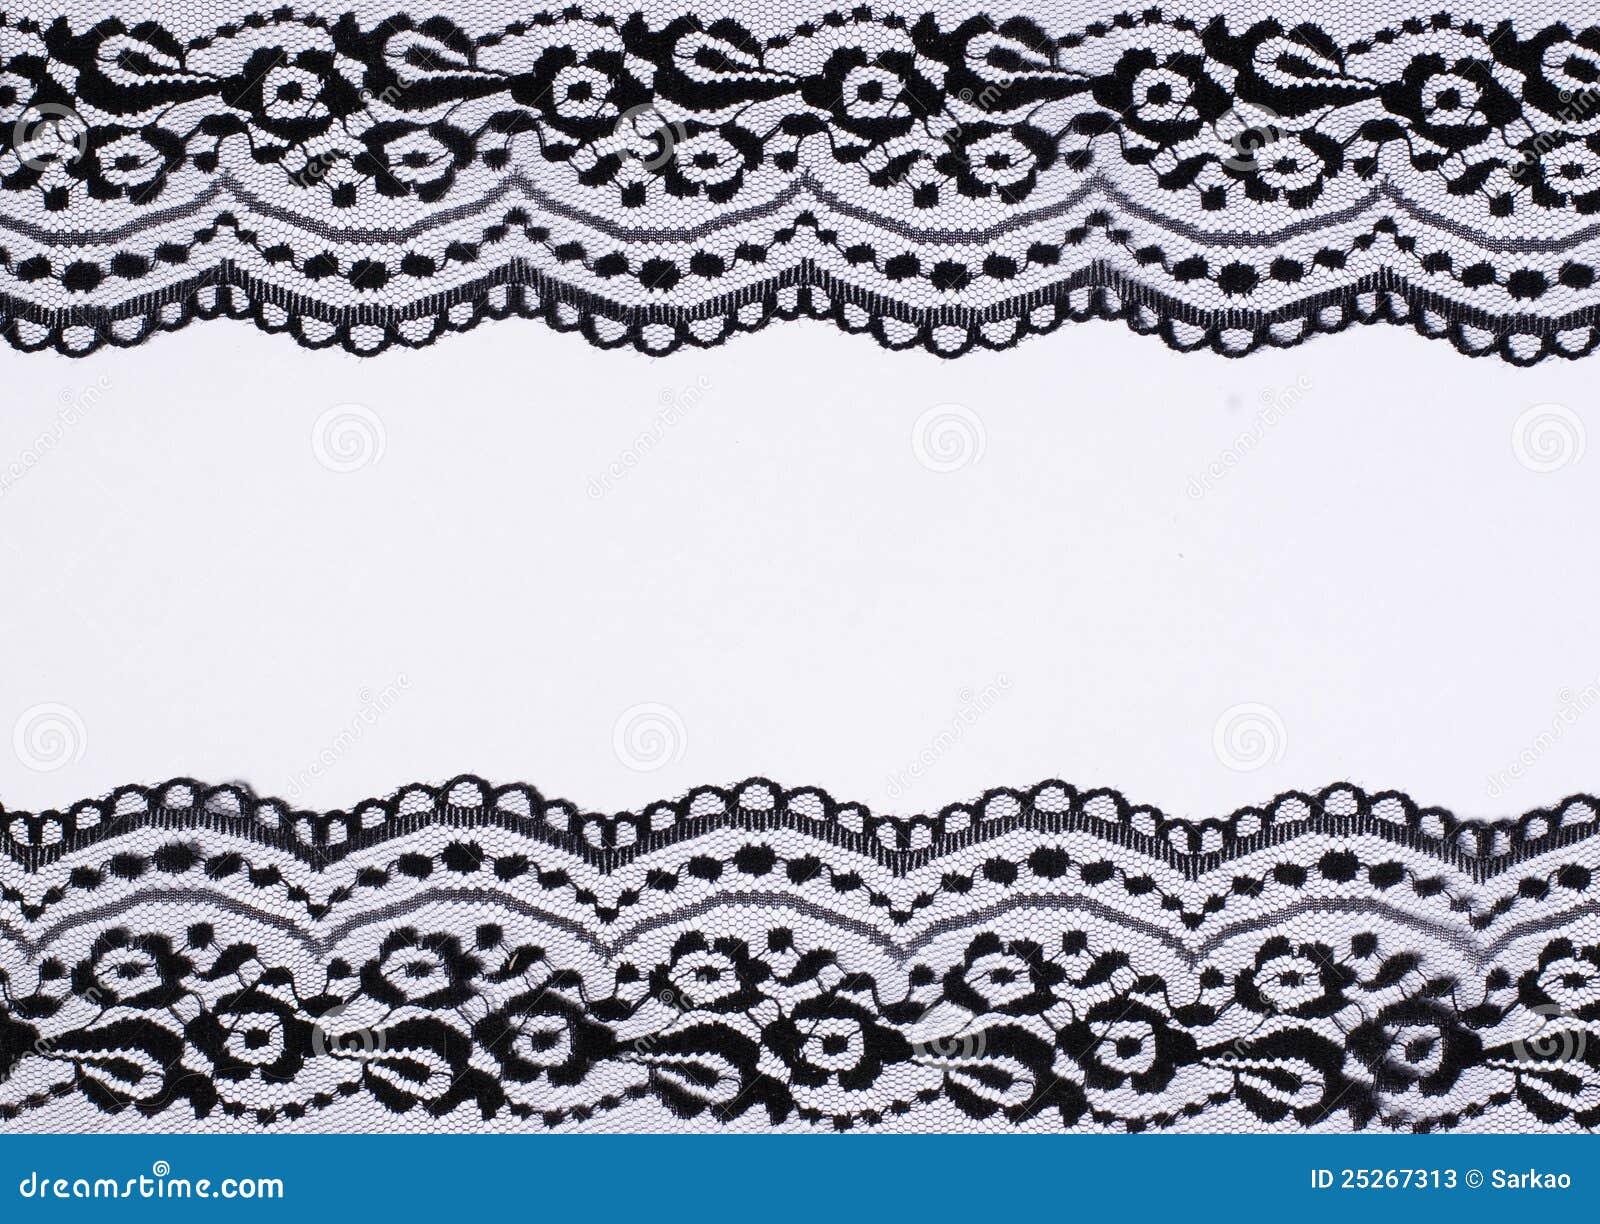 Lace Frame Stock Photos - Image: 25267313